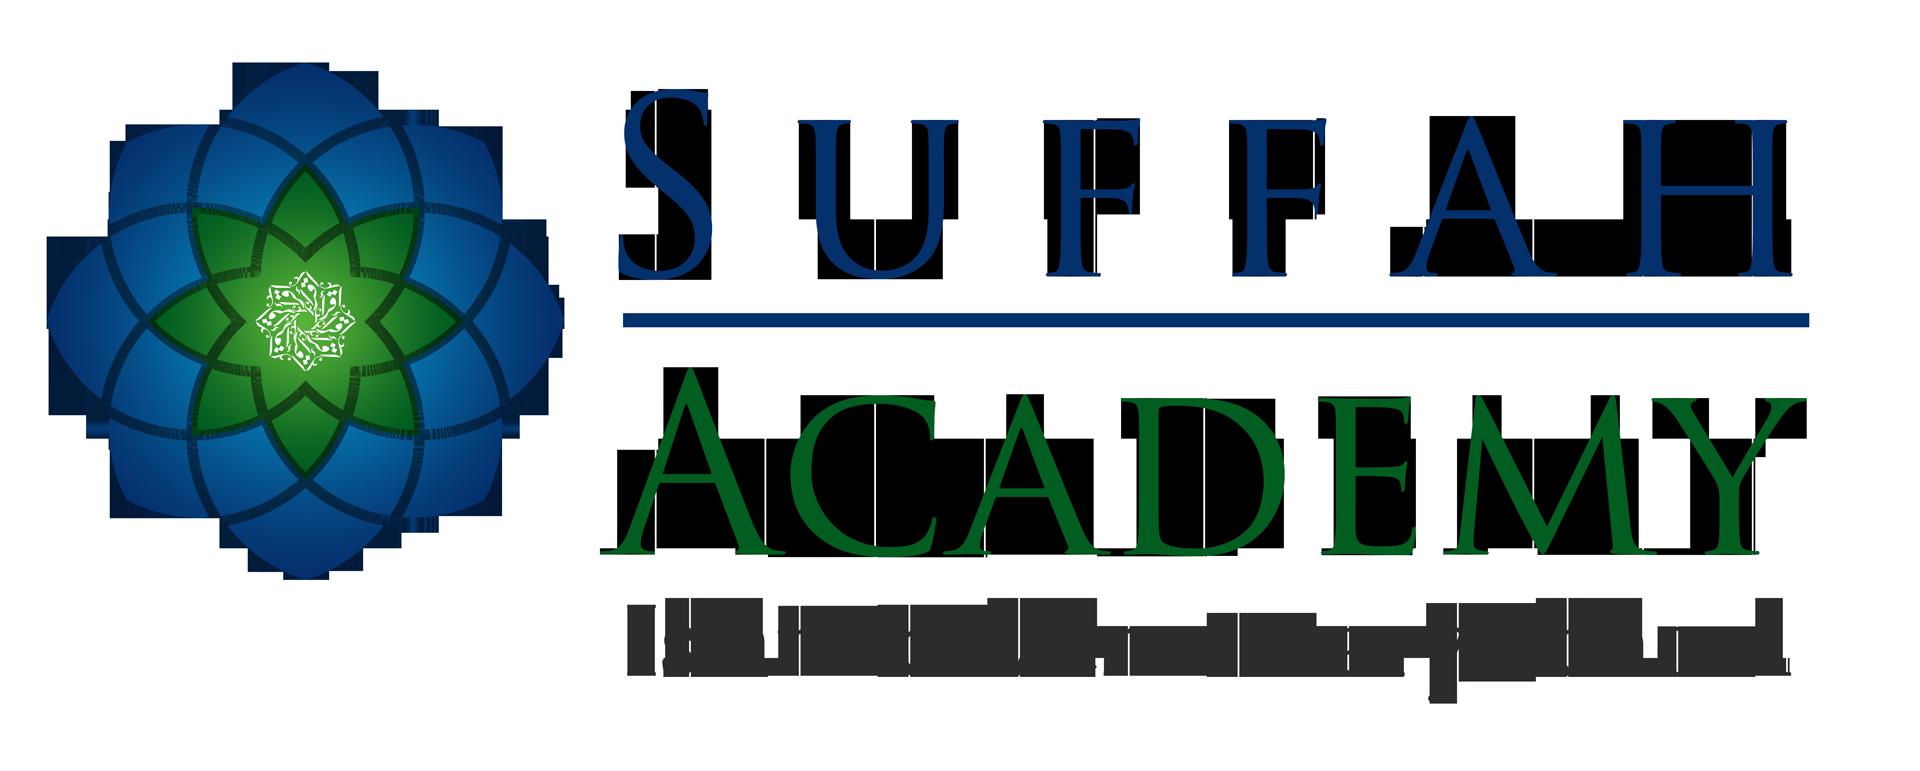 Islamic School in Ontario, Canada